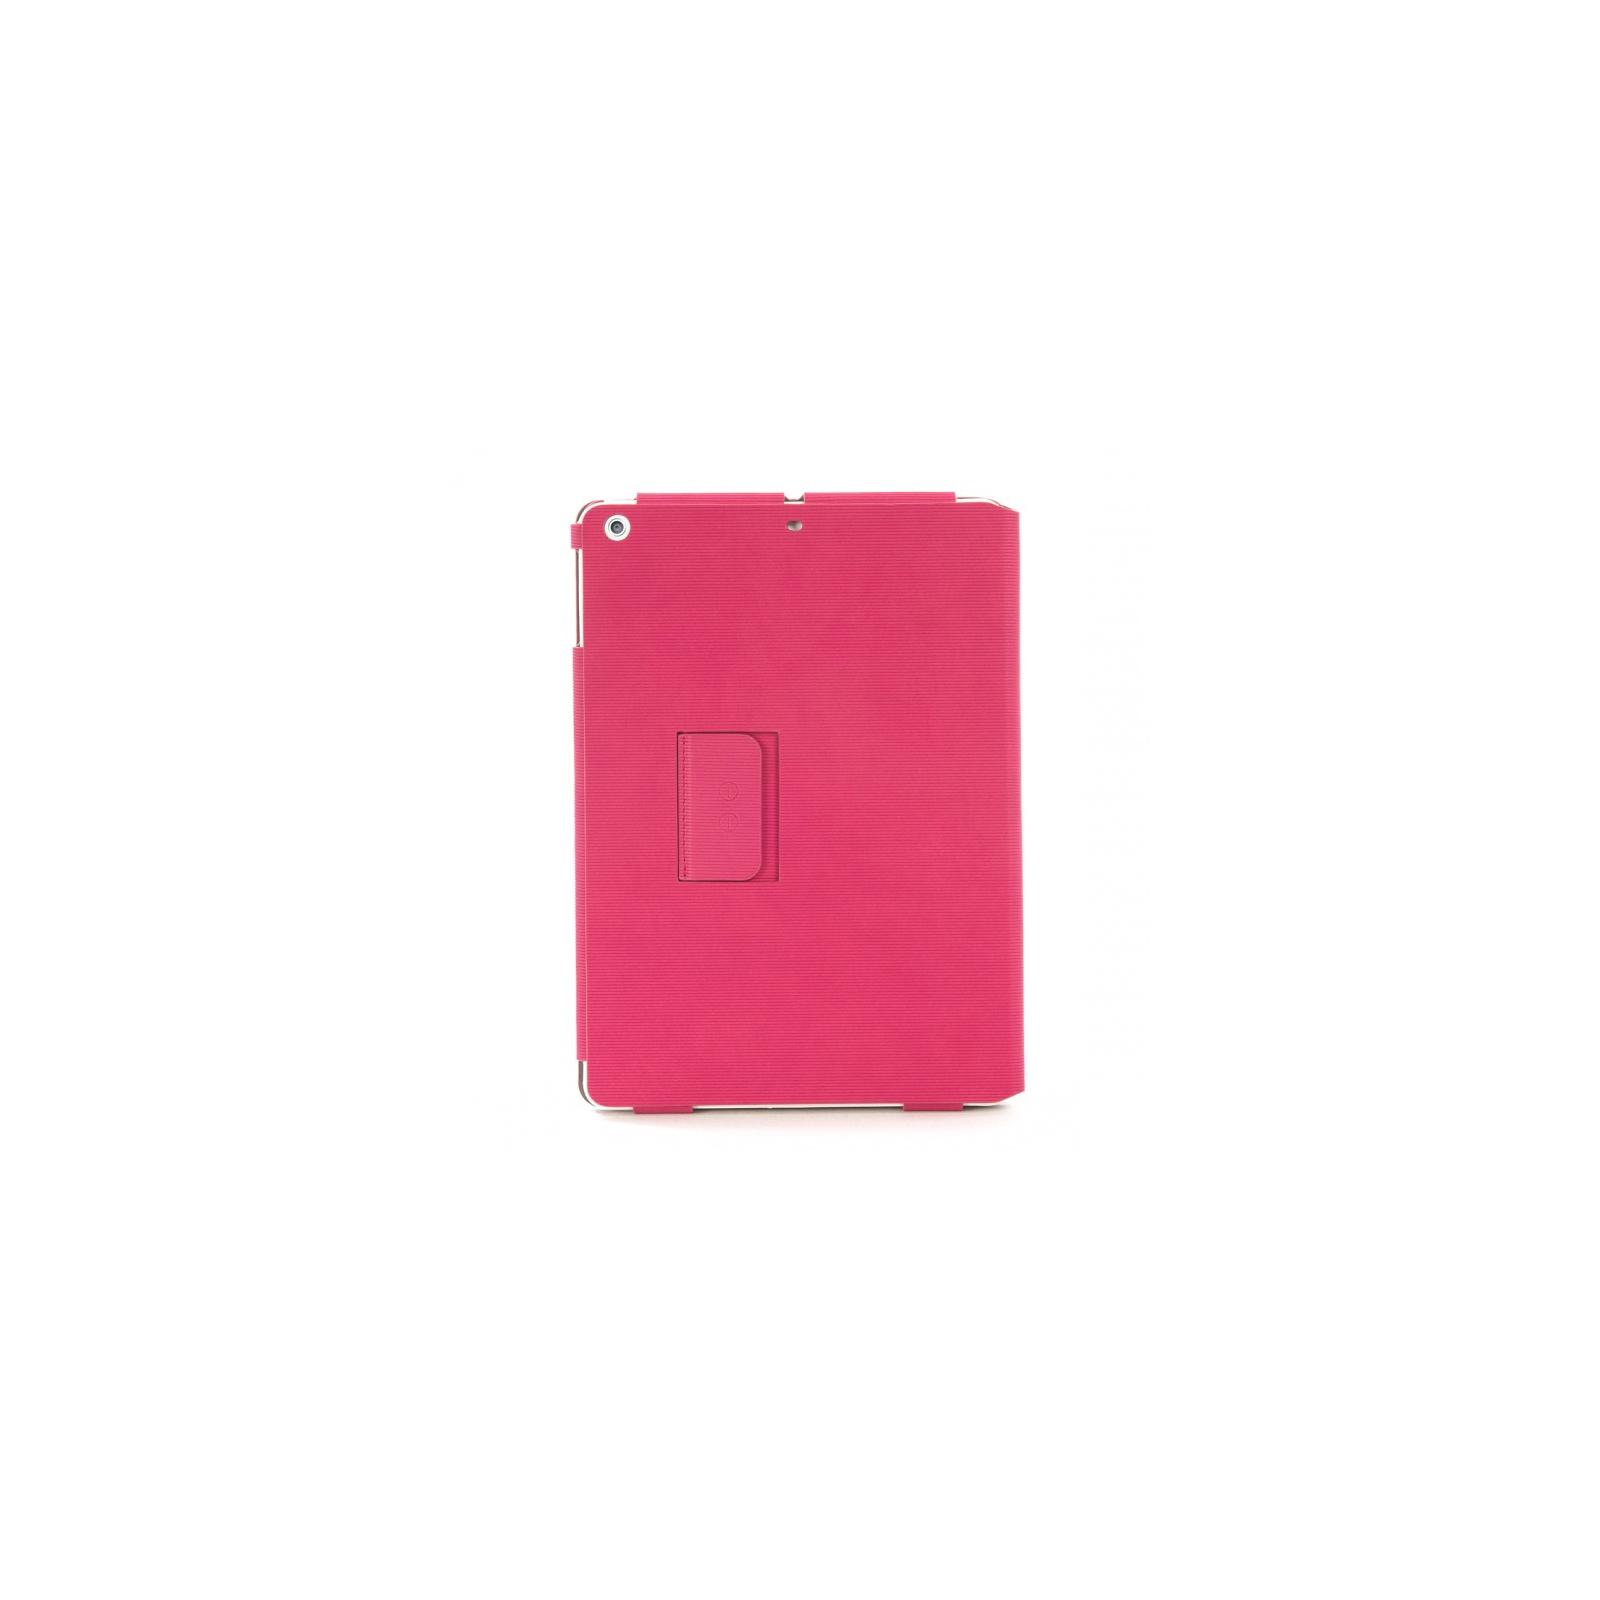 Чехол для планшета Tucano iPad Air Fresco Fusica (IPD5F-F) изображение 4